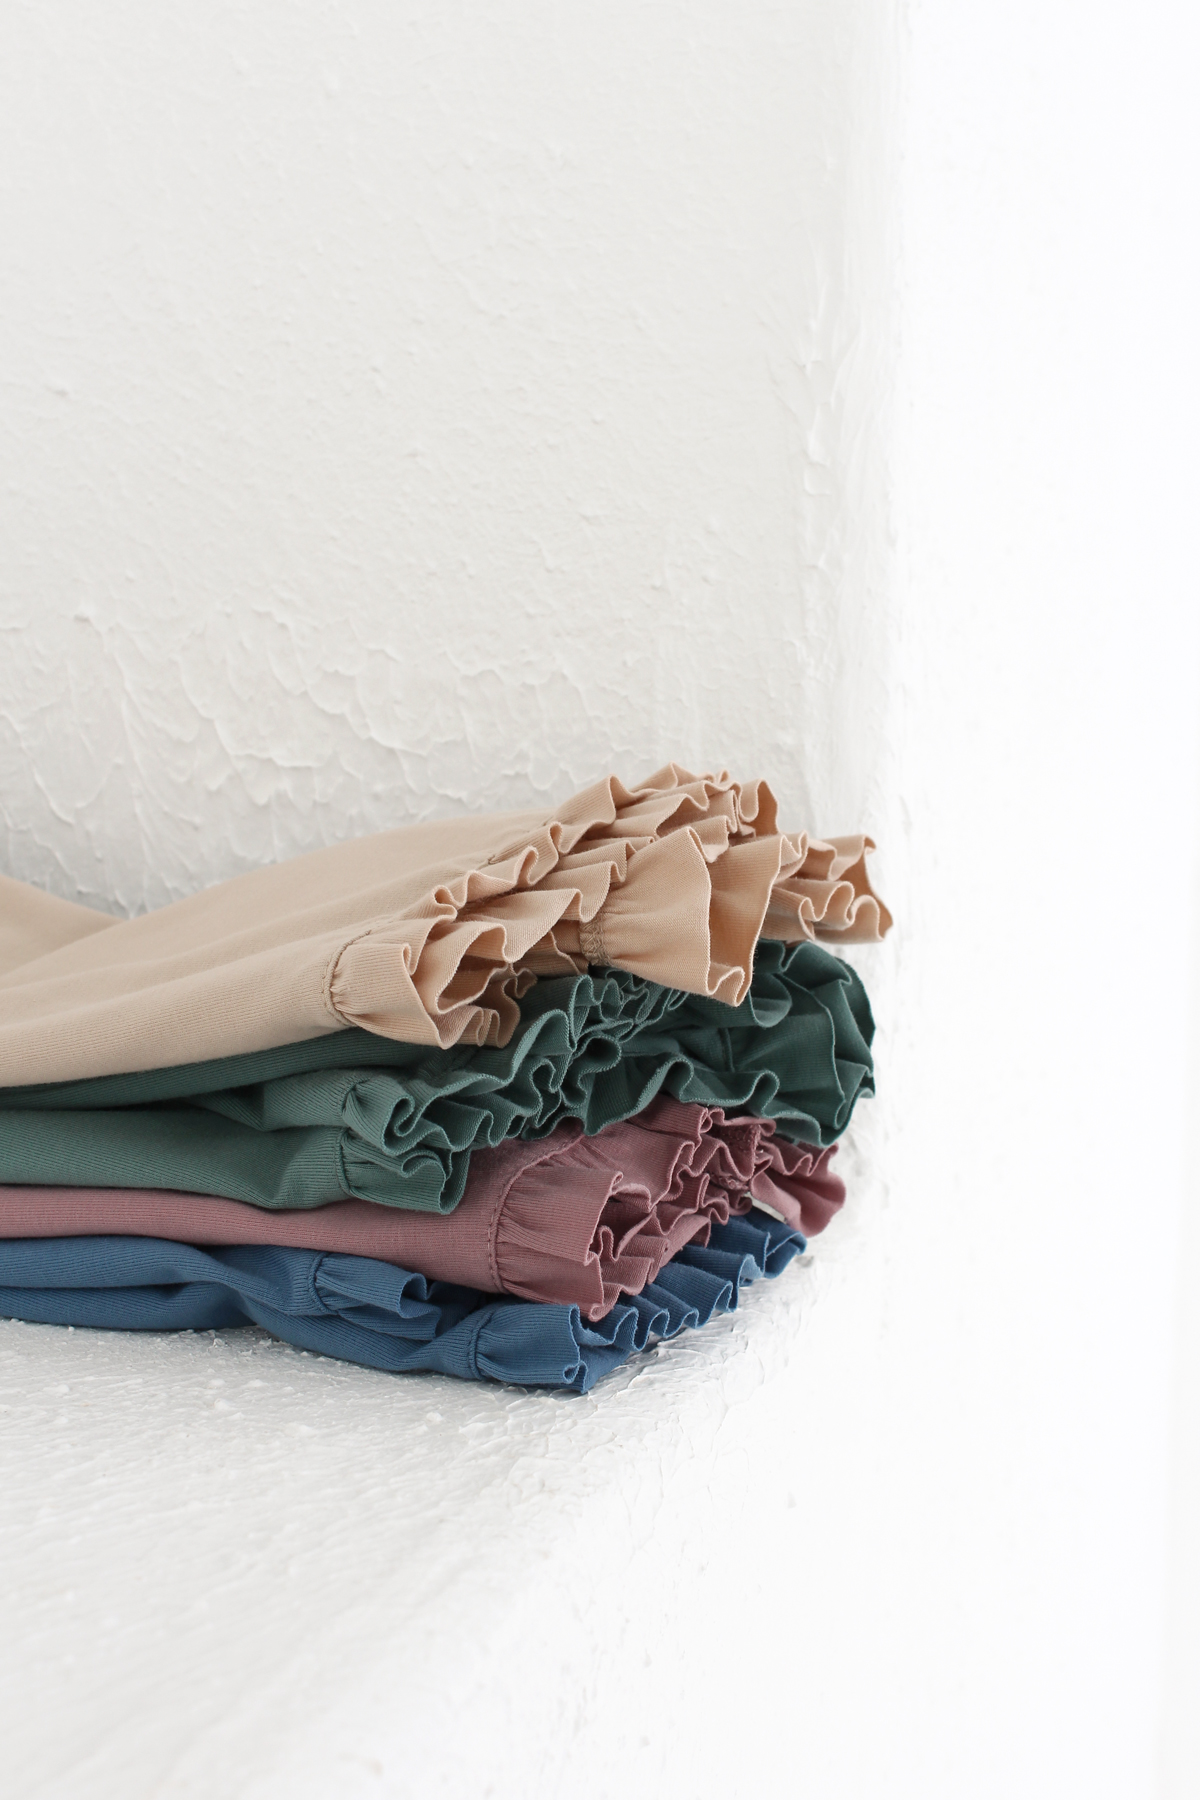 Knit Fabric Ruffle Shorts and Top Pajama Set